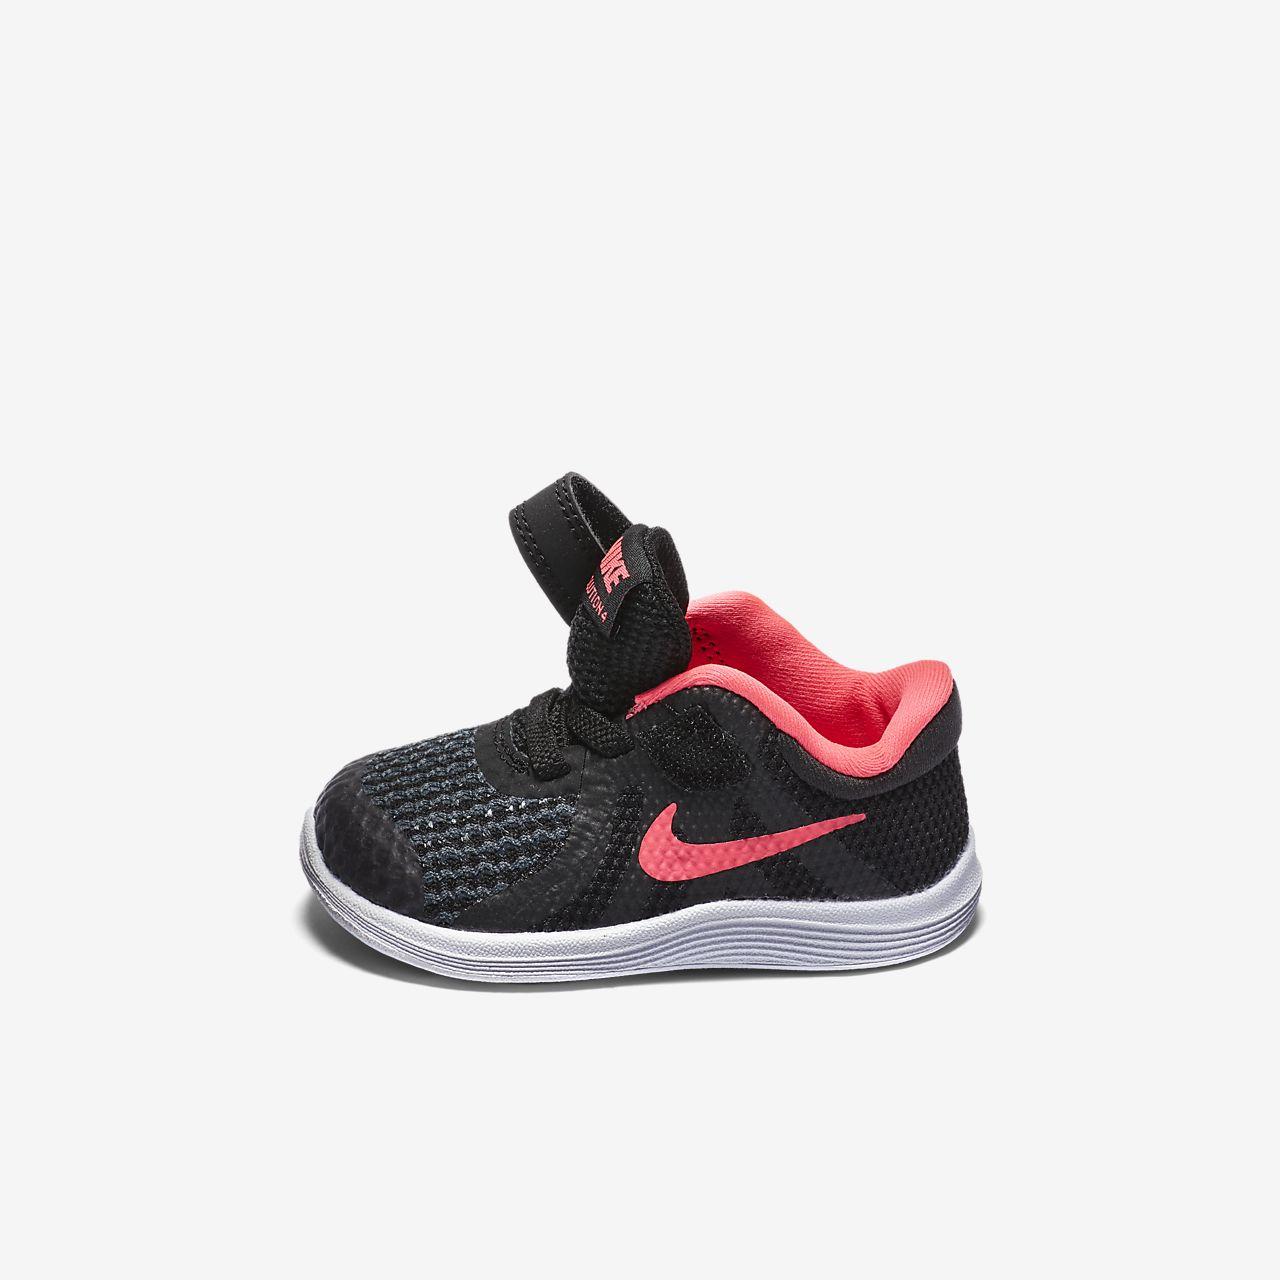 7af3c06e43f Nike Revolution 4 Baby & Toddler Shoe. Nike.com AU